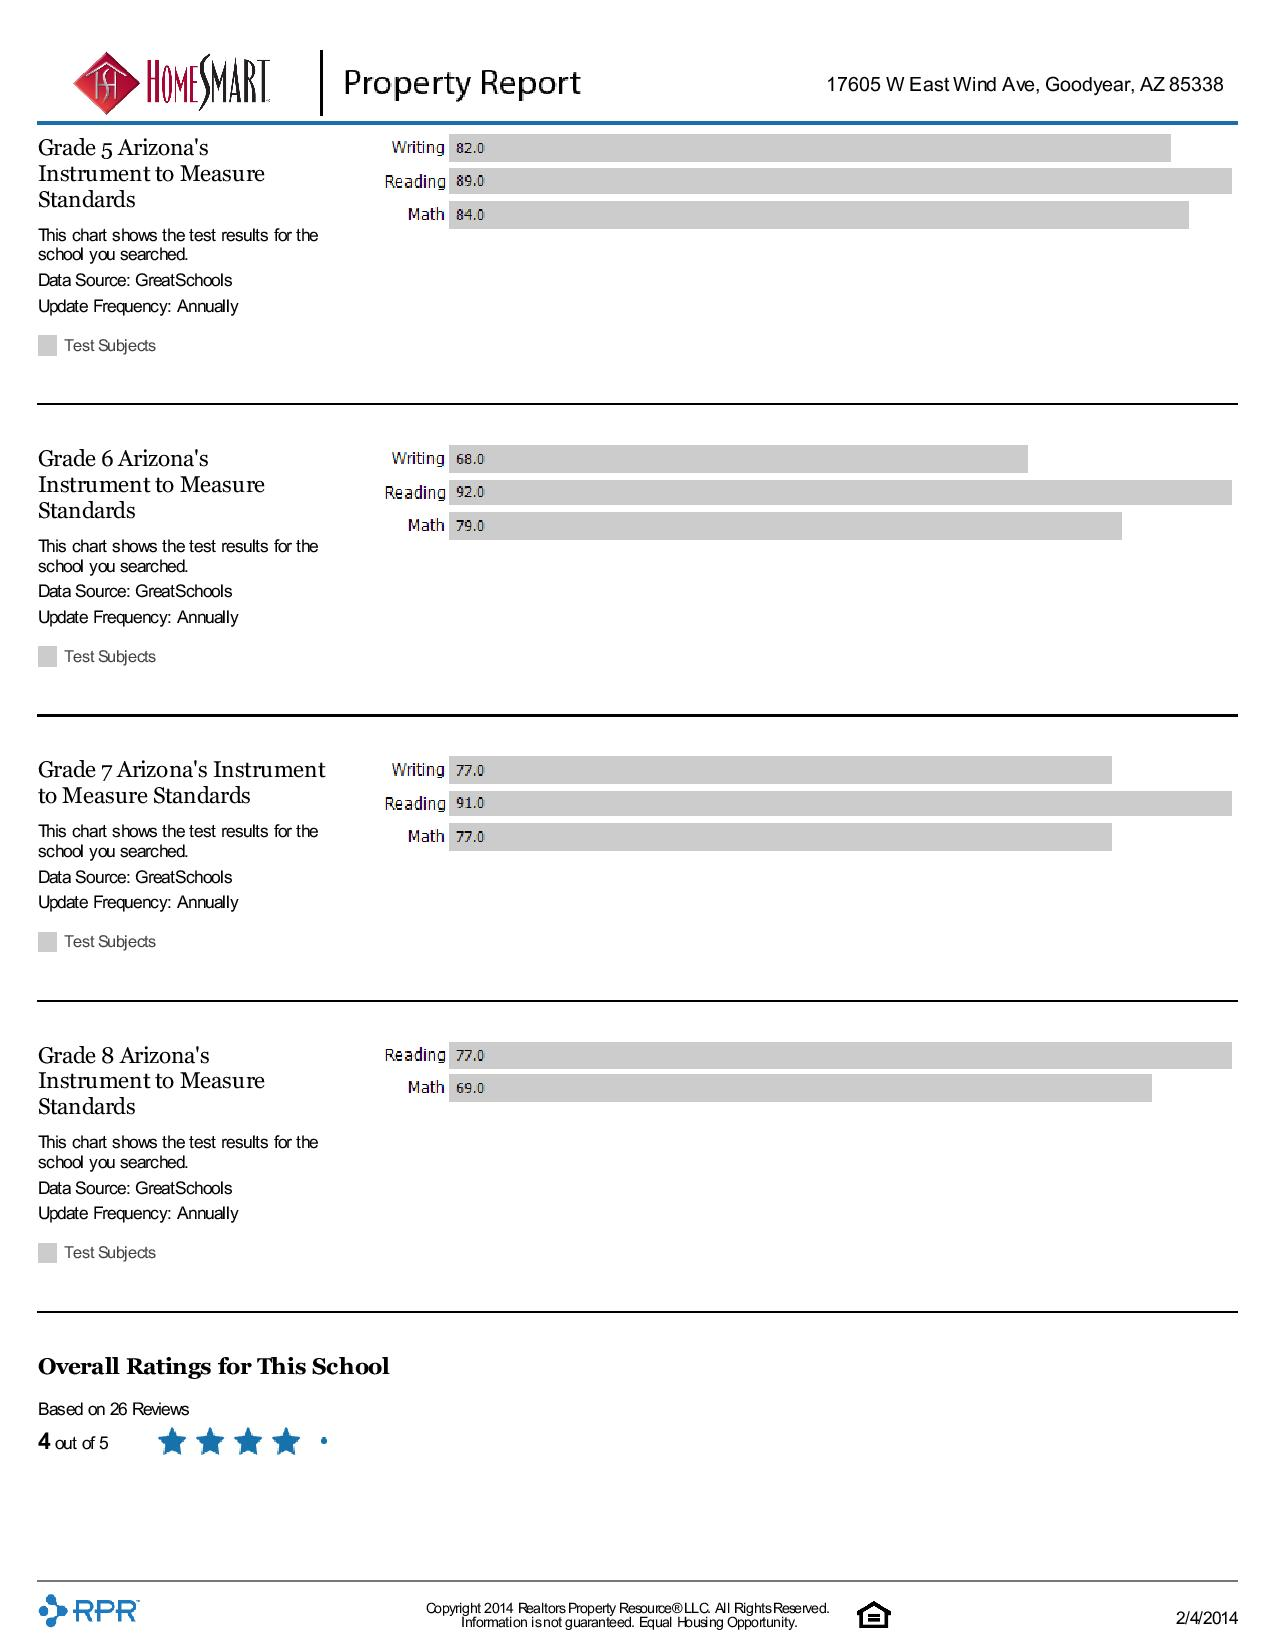 17605-W-East-Wind-Ave-Goodyear-AZ-85338.pdf-page-014